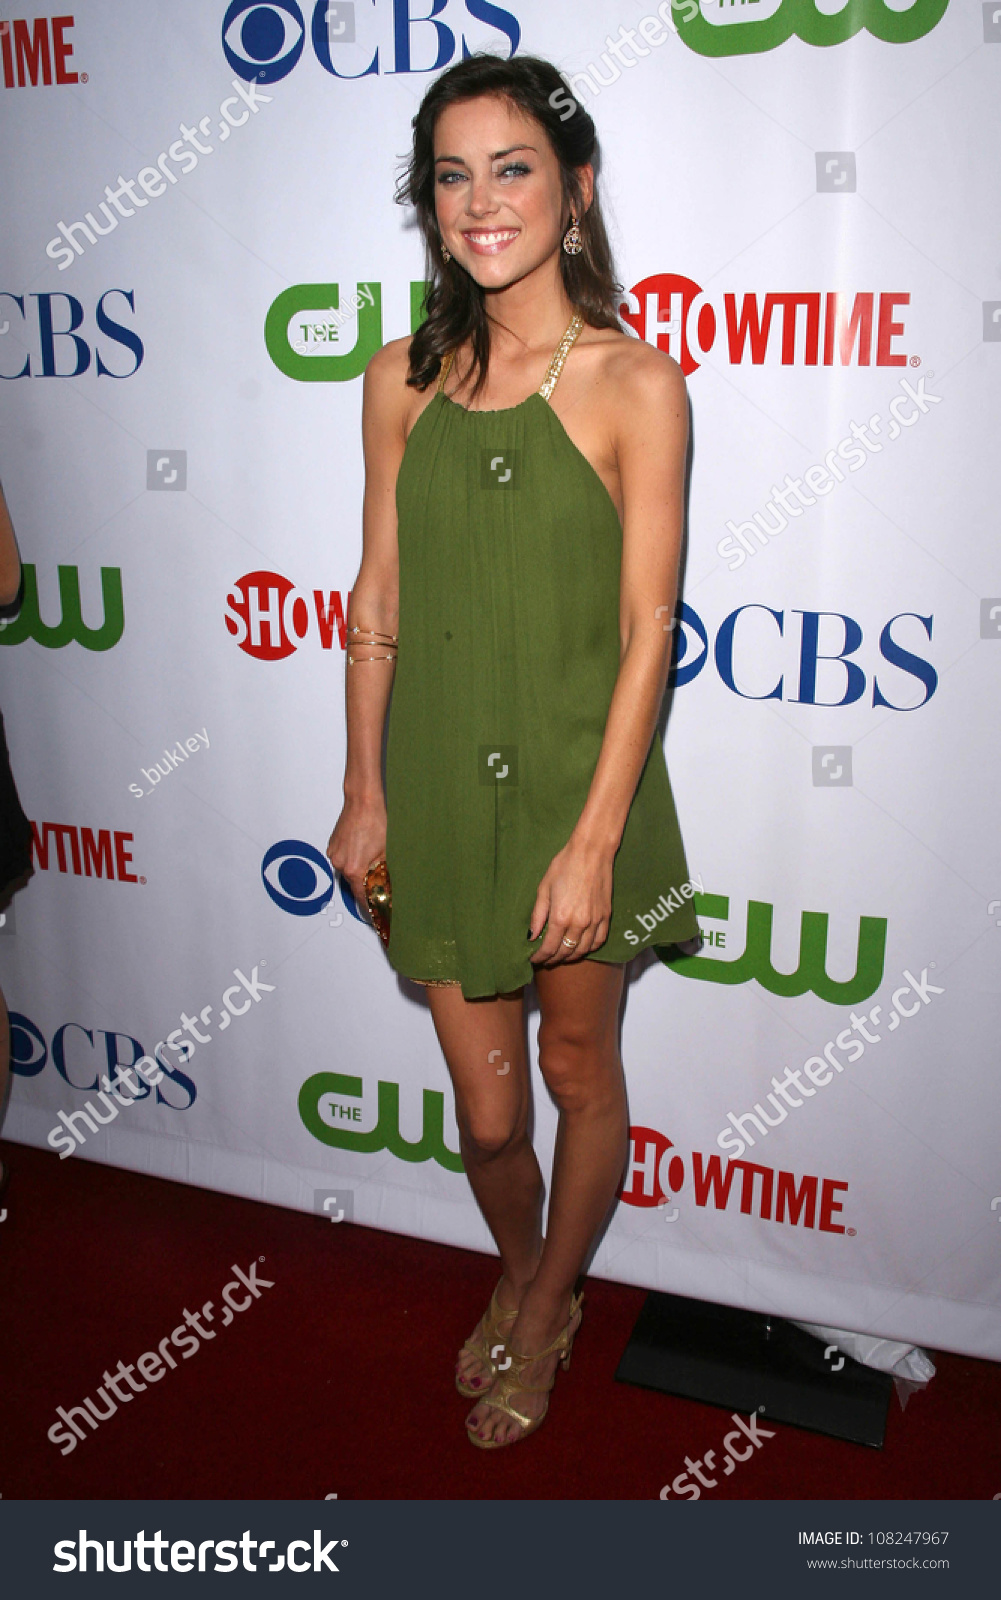 Jessica Stroup Cbs Cw Showtime Press Stock Photo (Edit Now